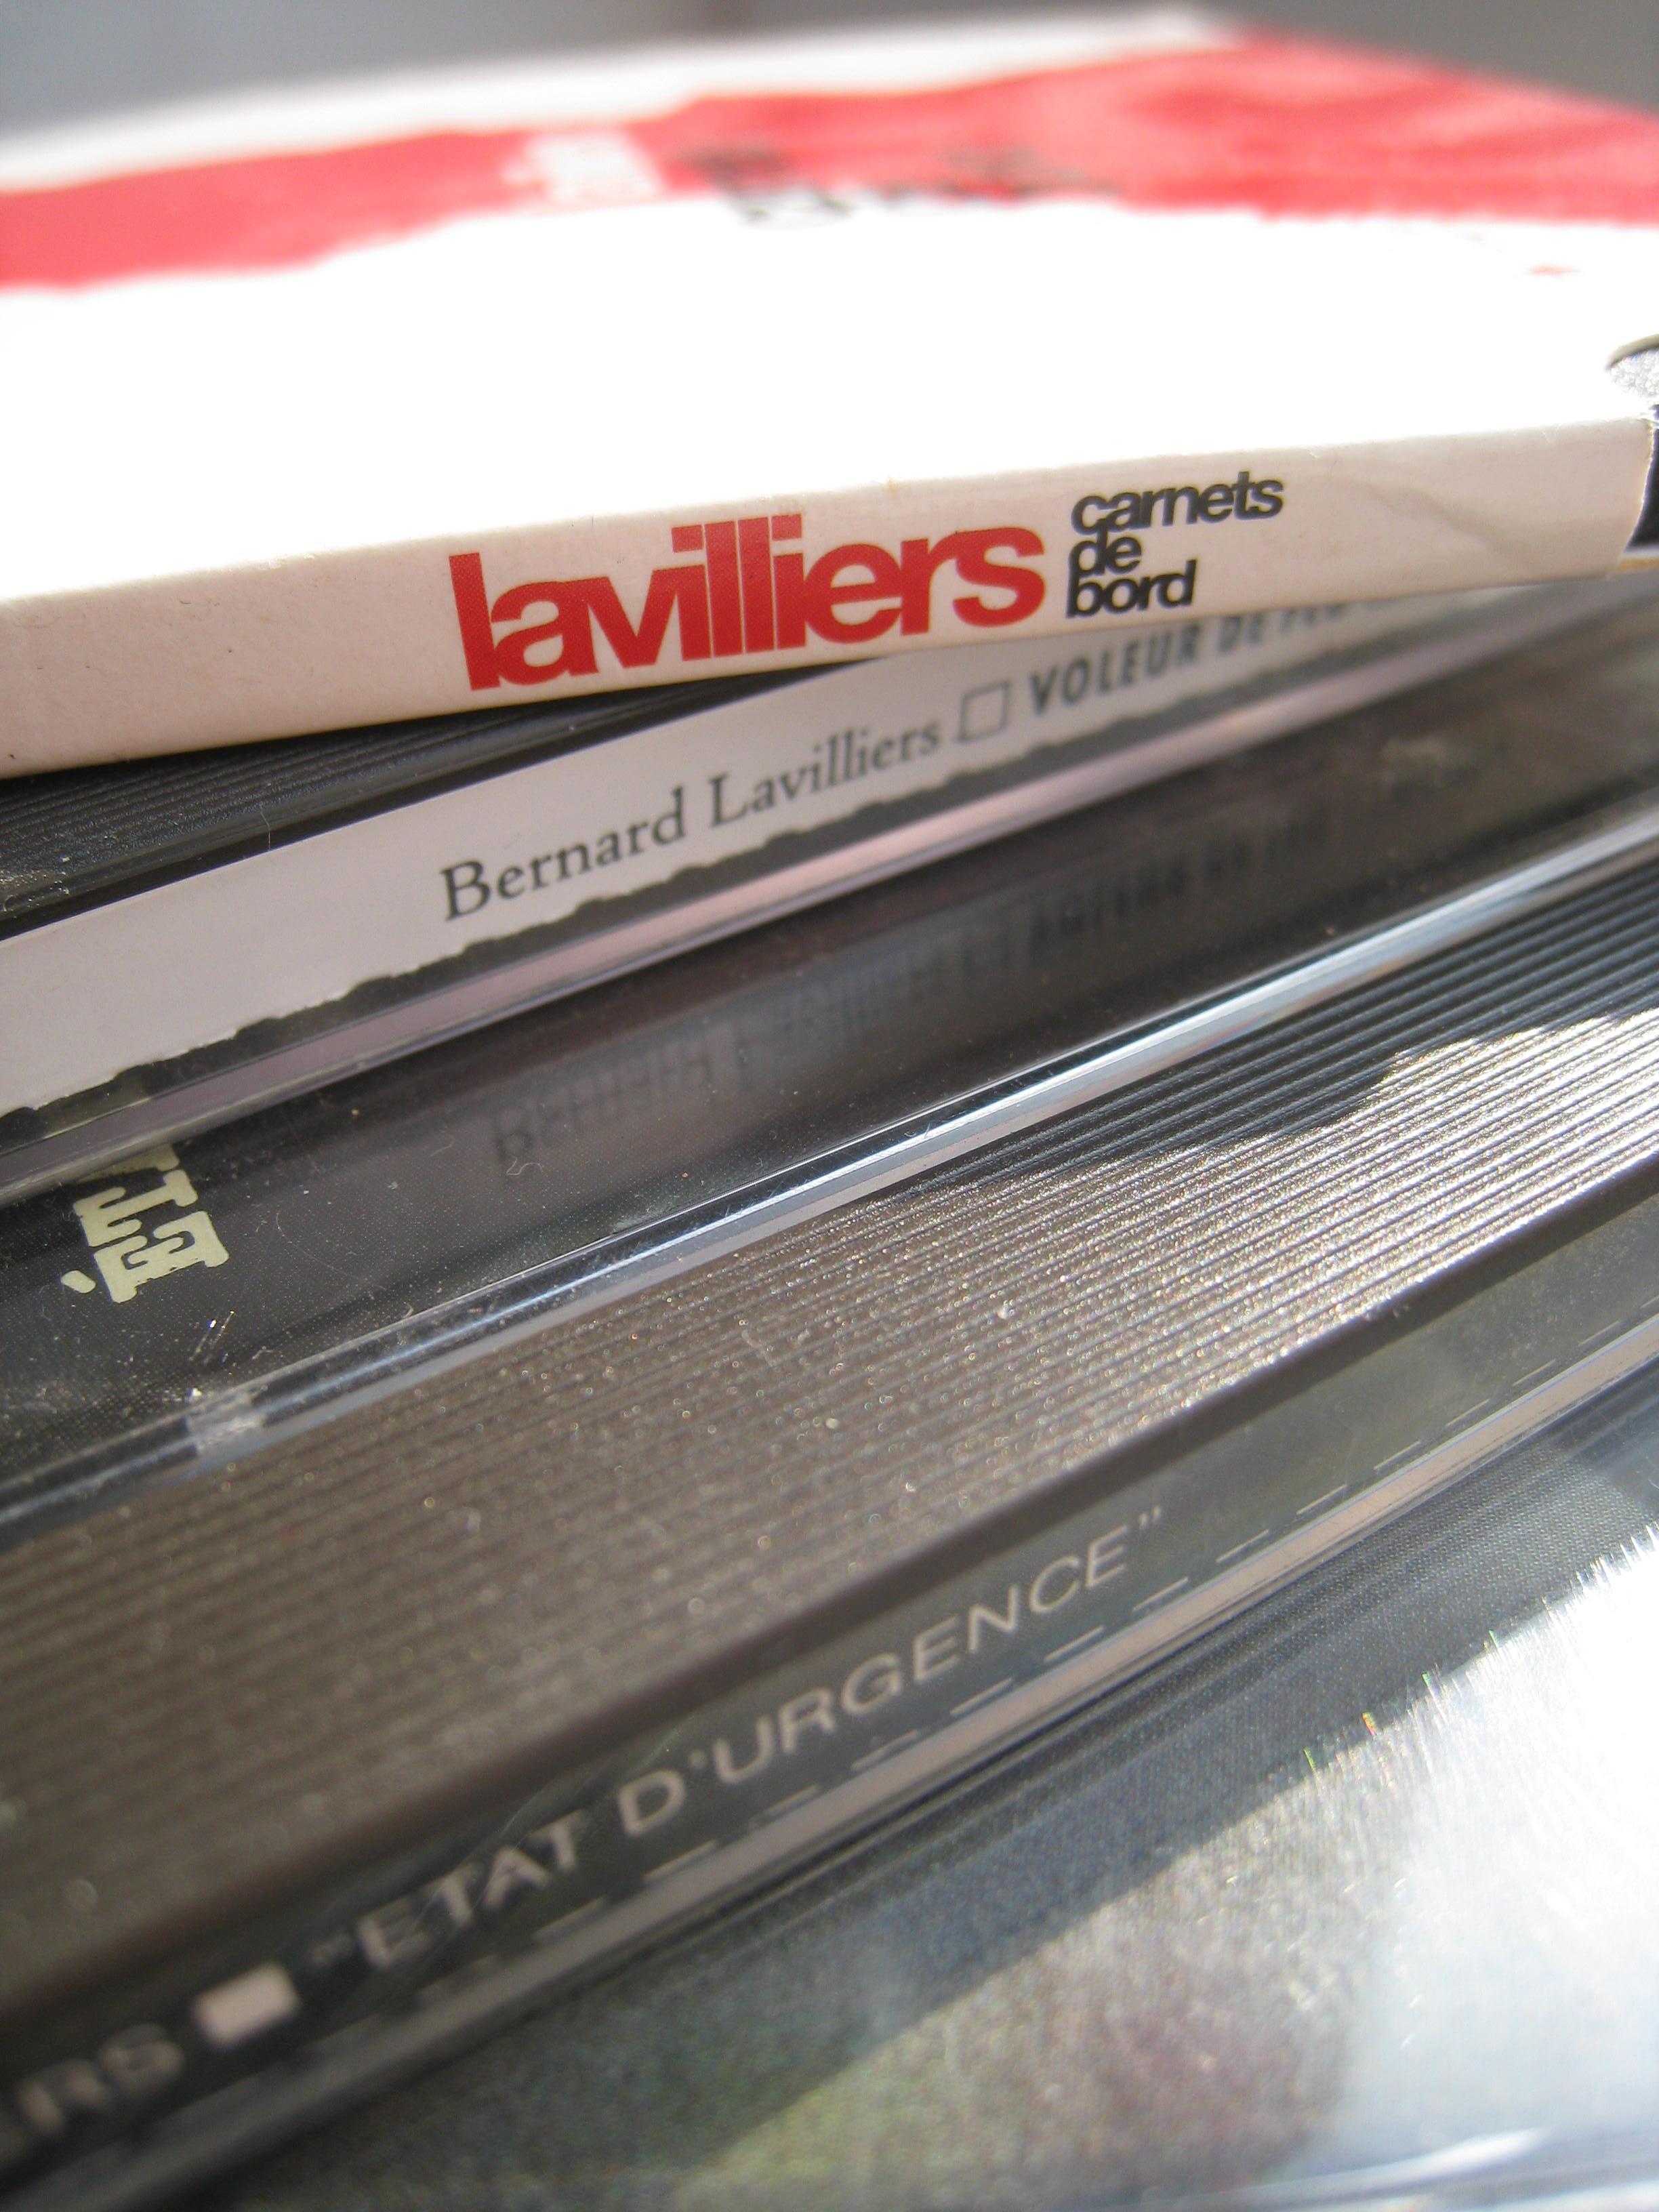 Lavilliers